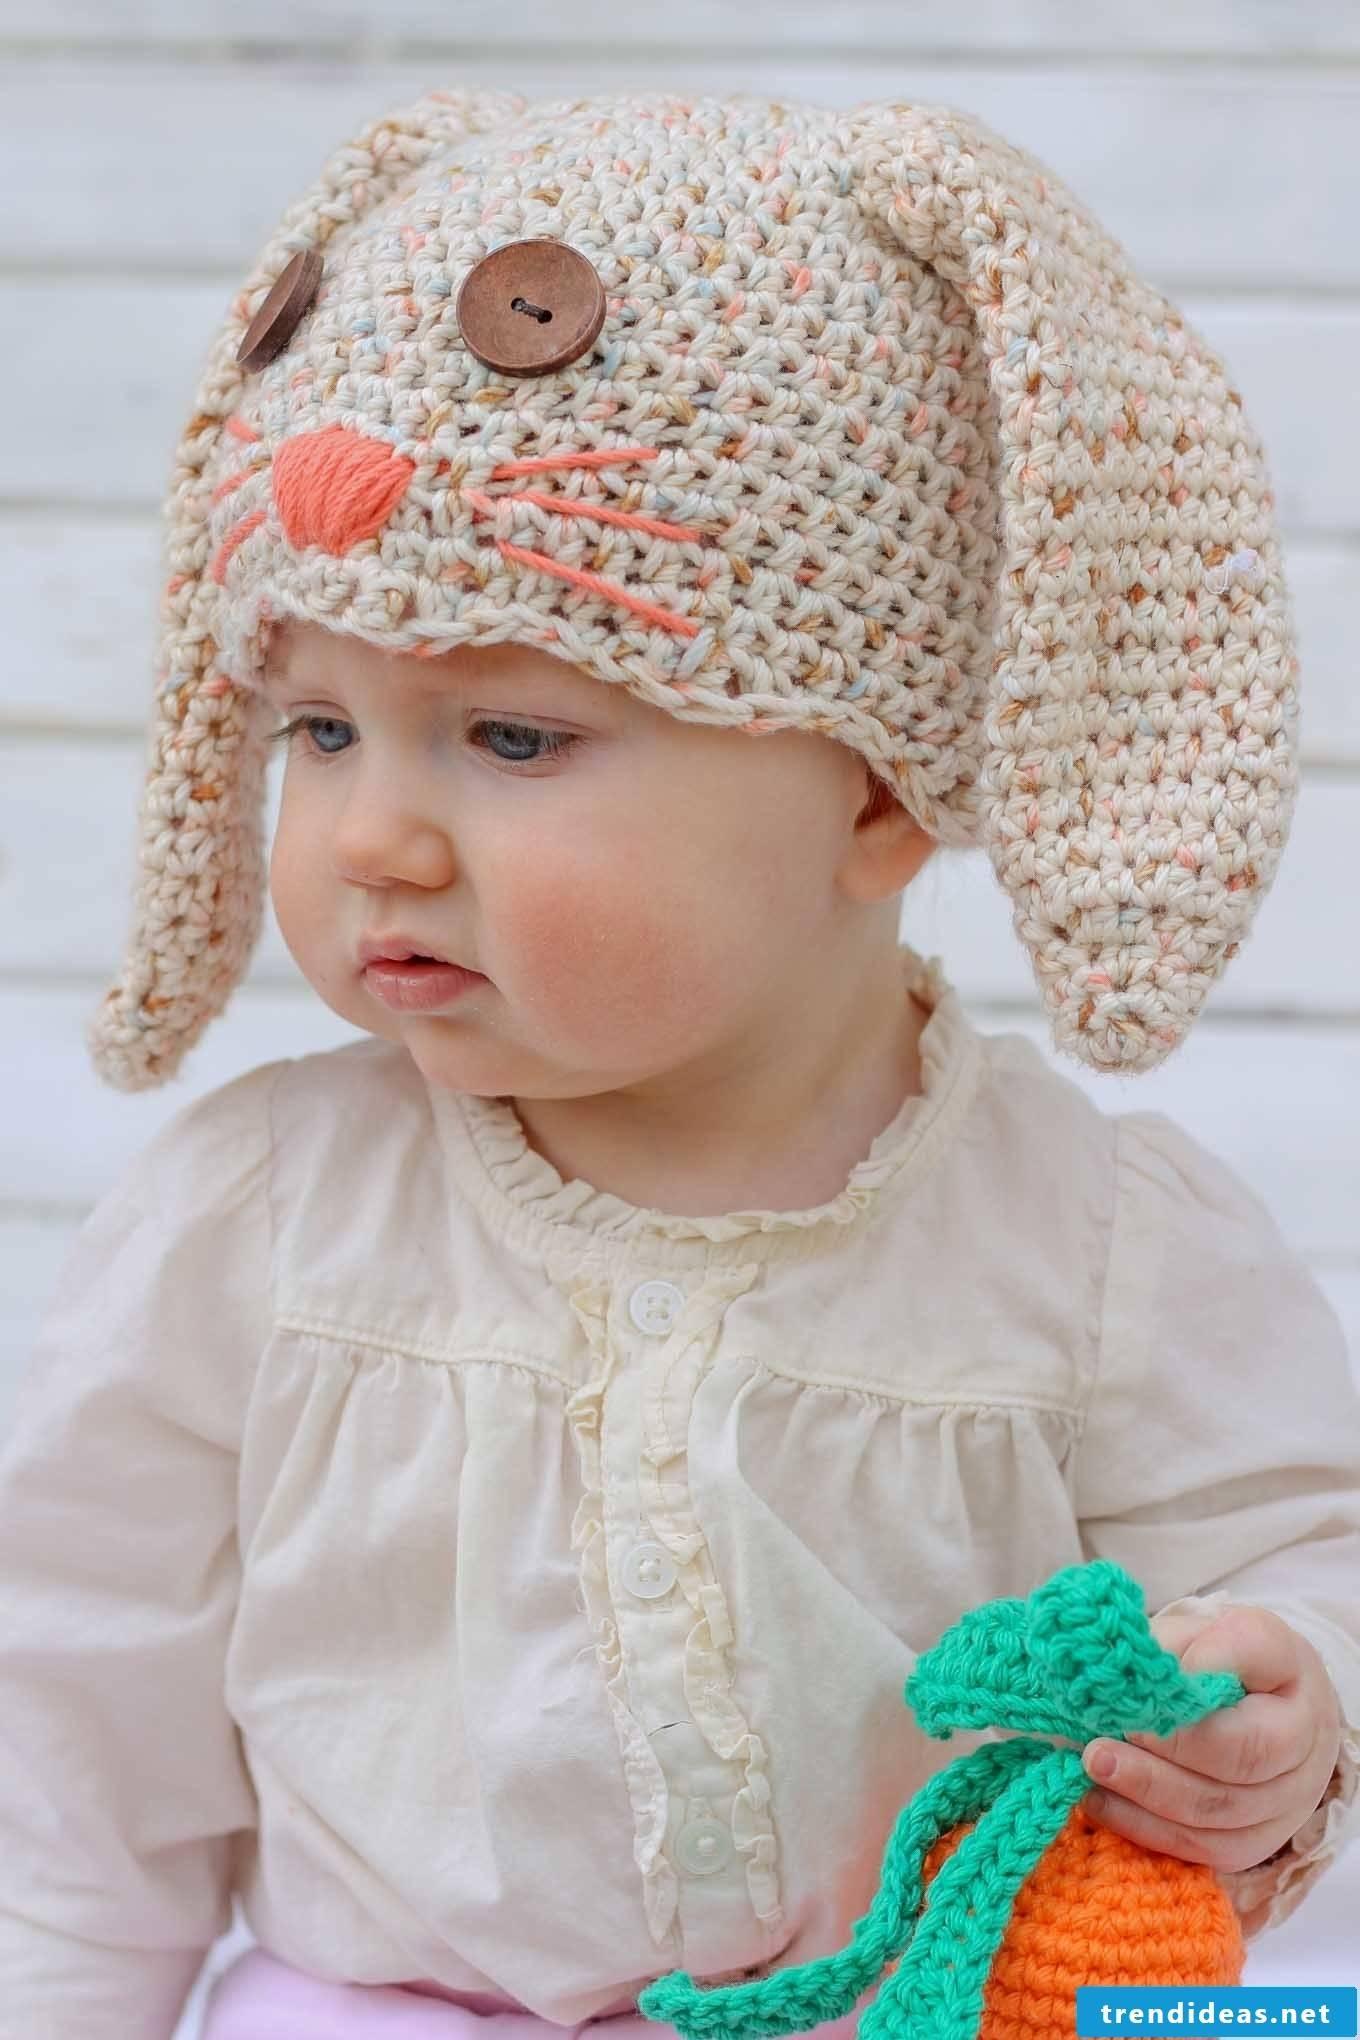 The no bunny crochet hat